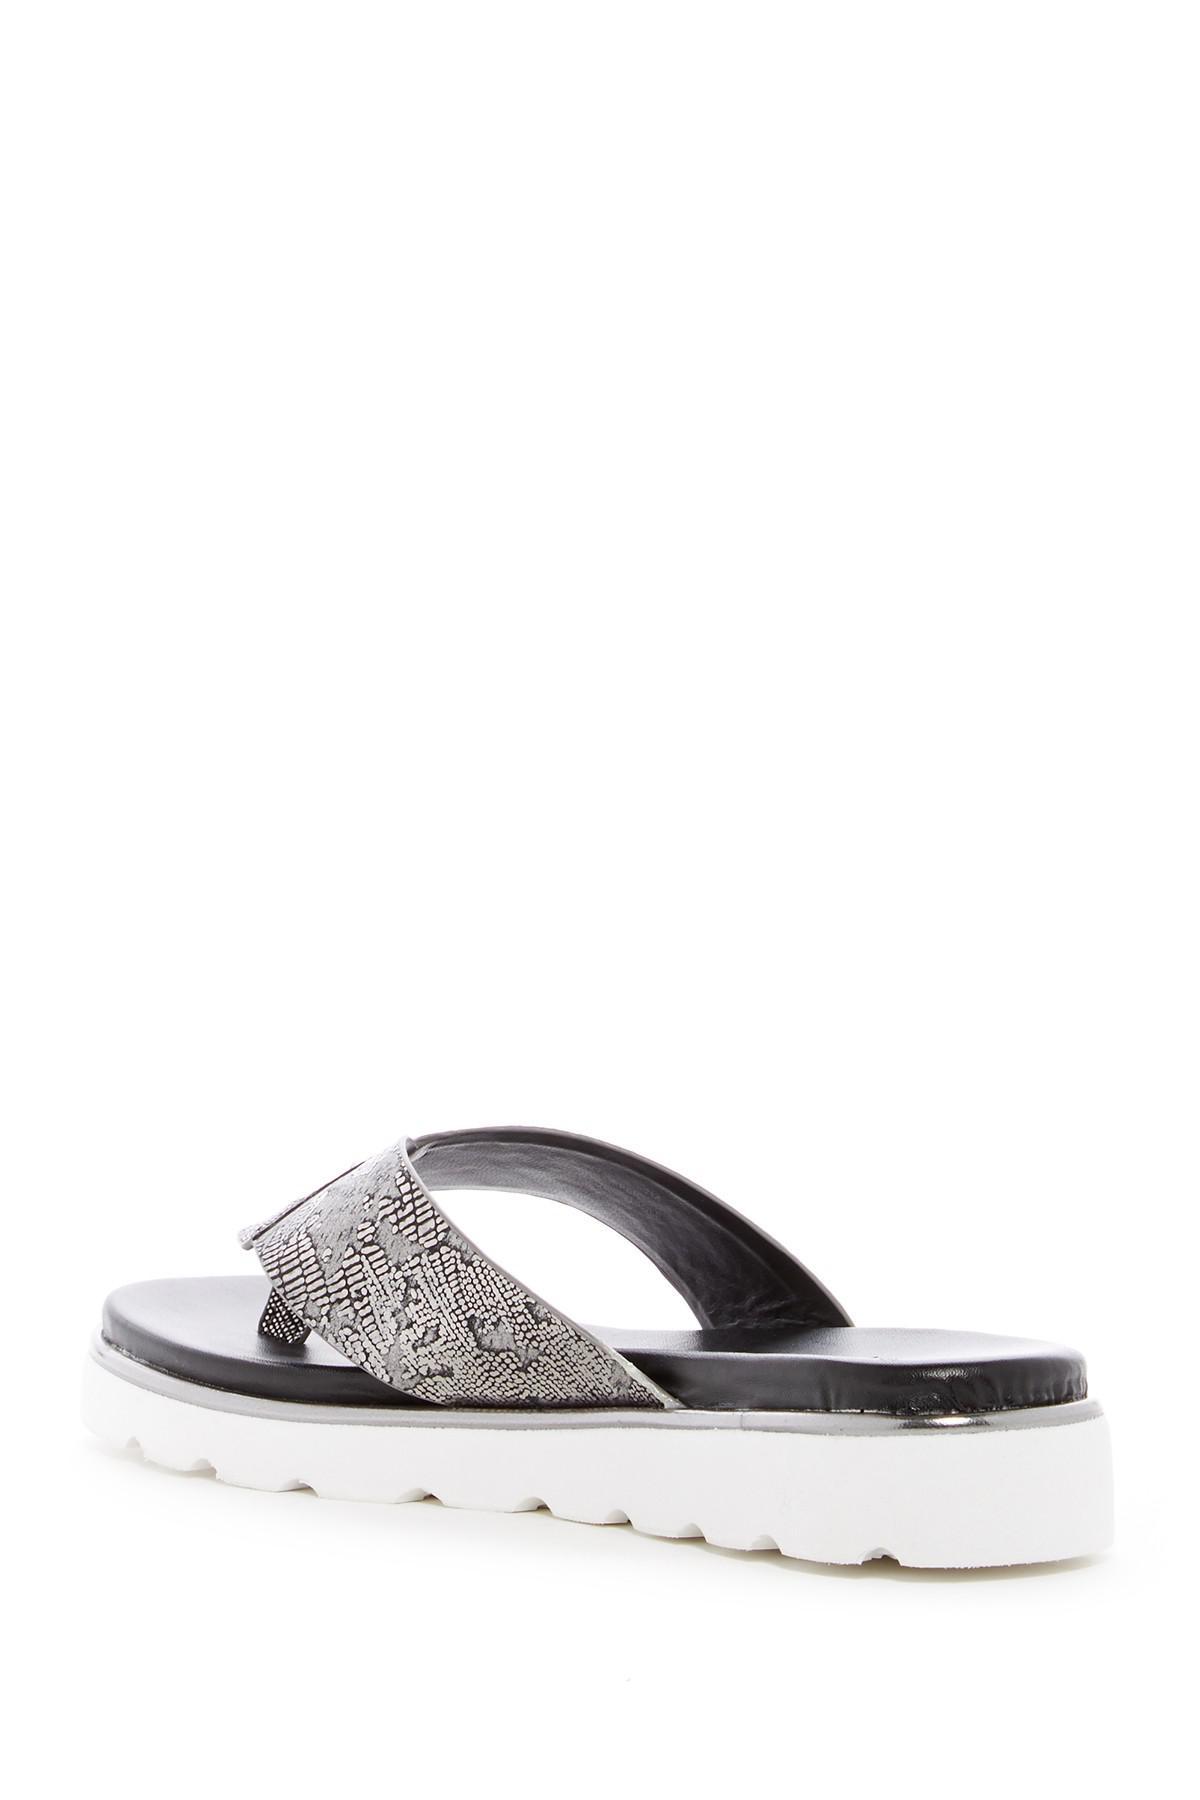 e933cde2c0d3be Lyst - Donald J Pliner Leea Lizard Embossed Sandal